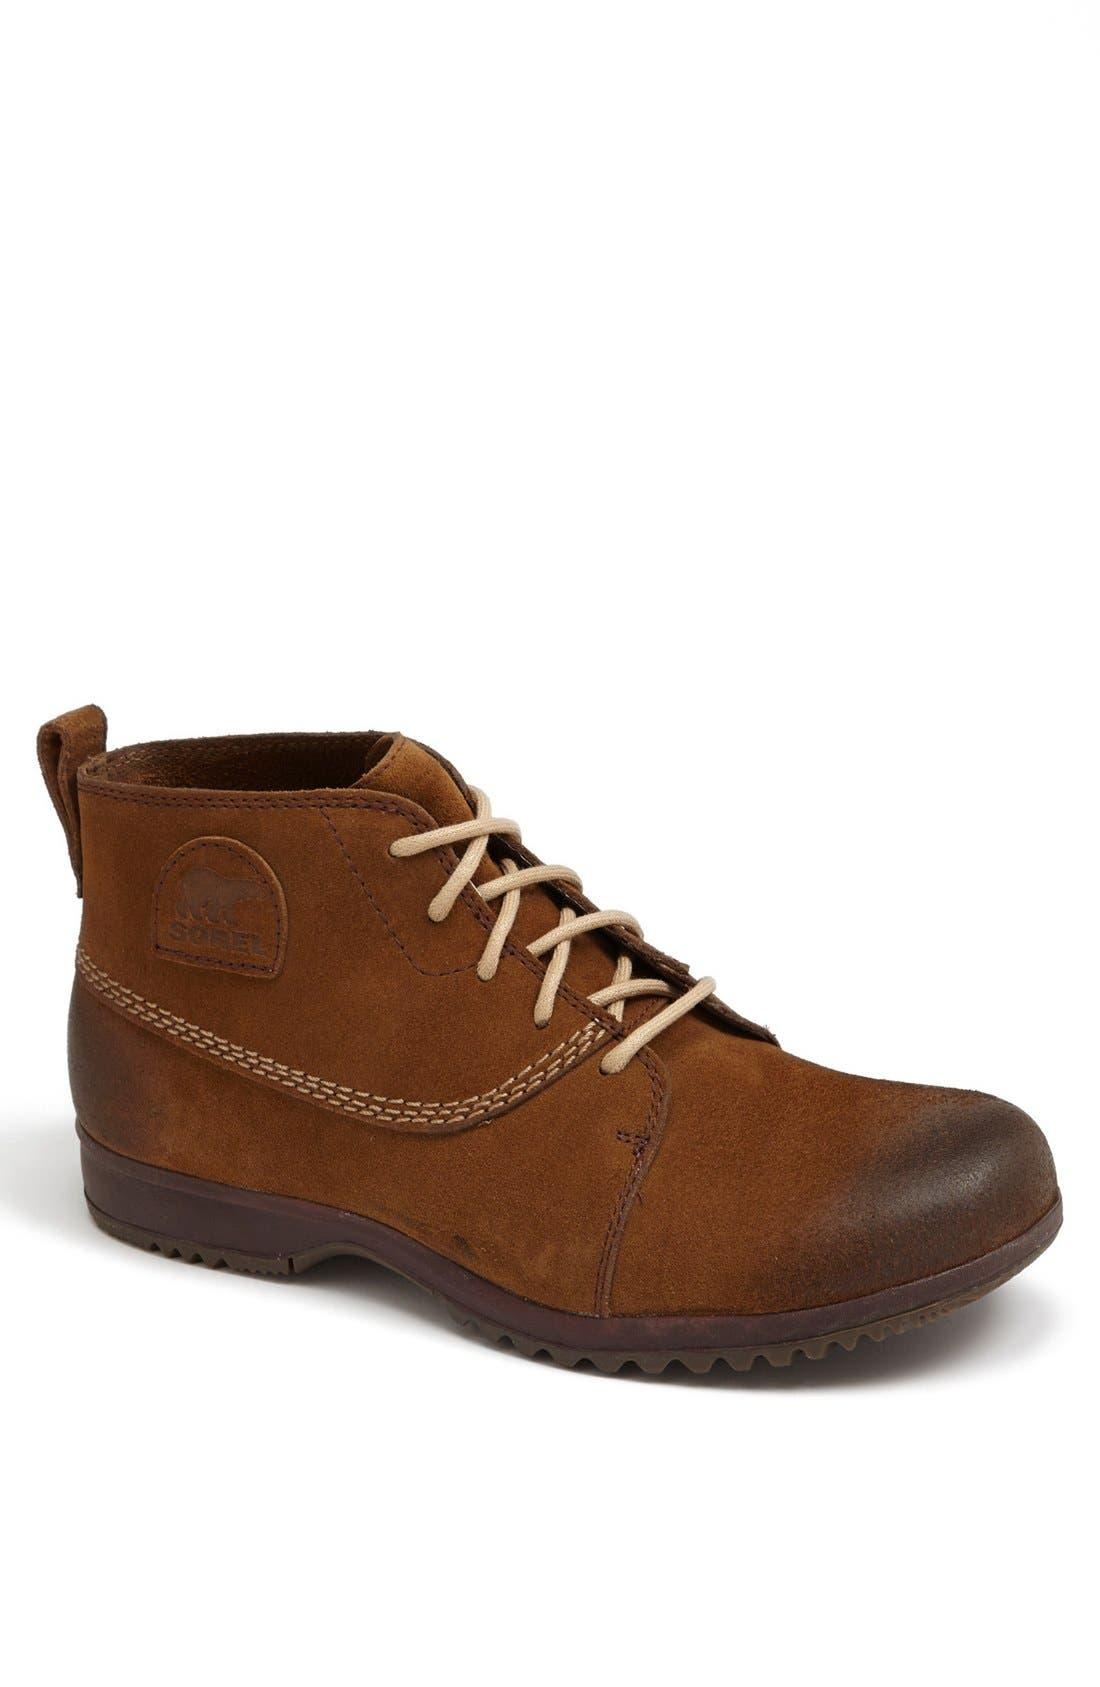 Alternate Image 1 Selected - SOREL 'Greely' Boot